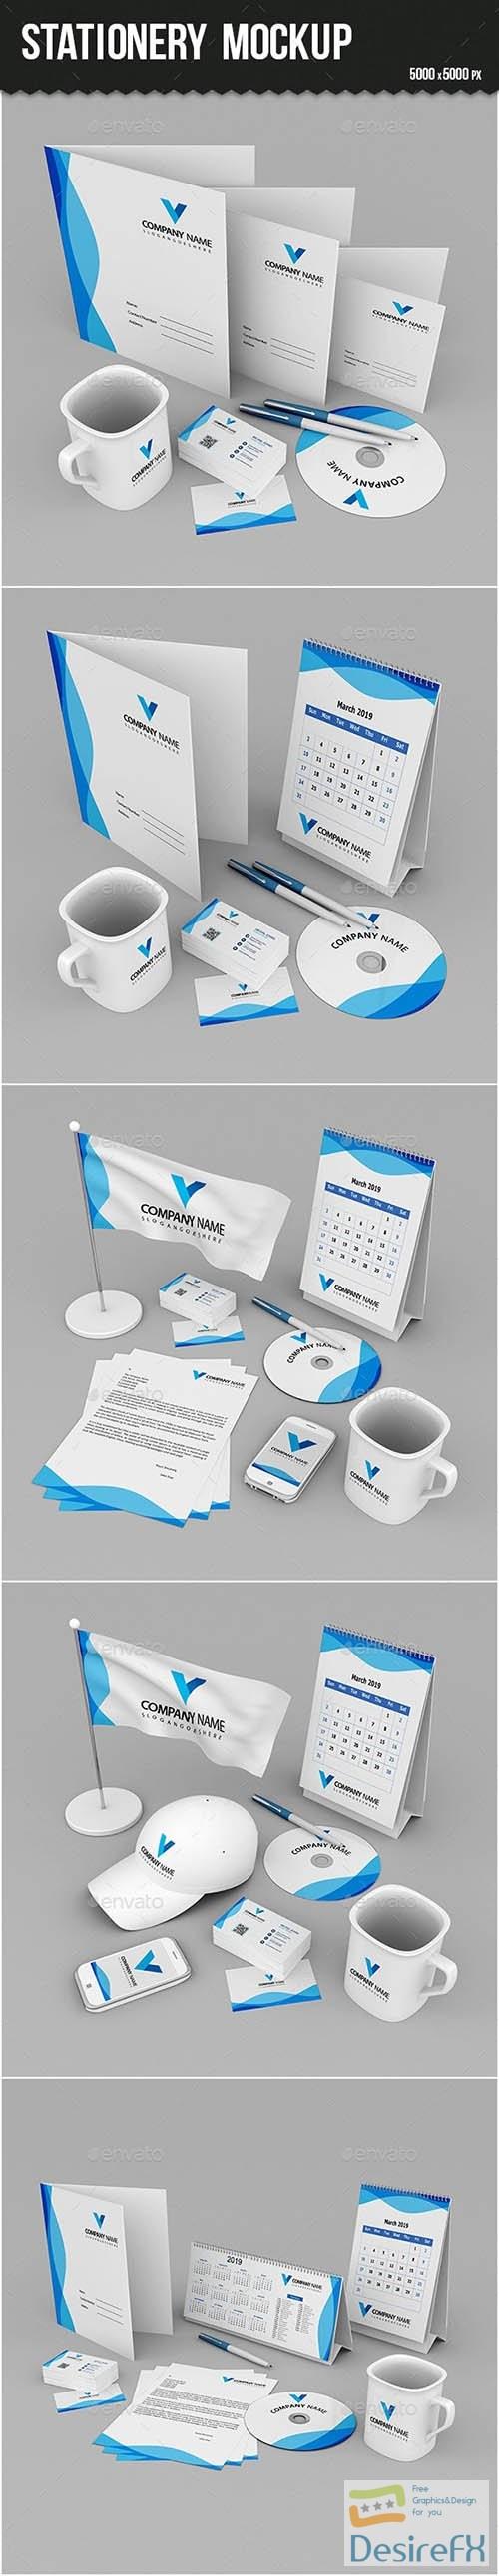 mock-up - Stationery Branding Mock-up 24262252